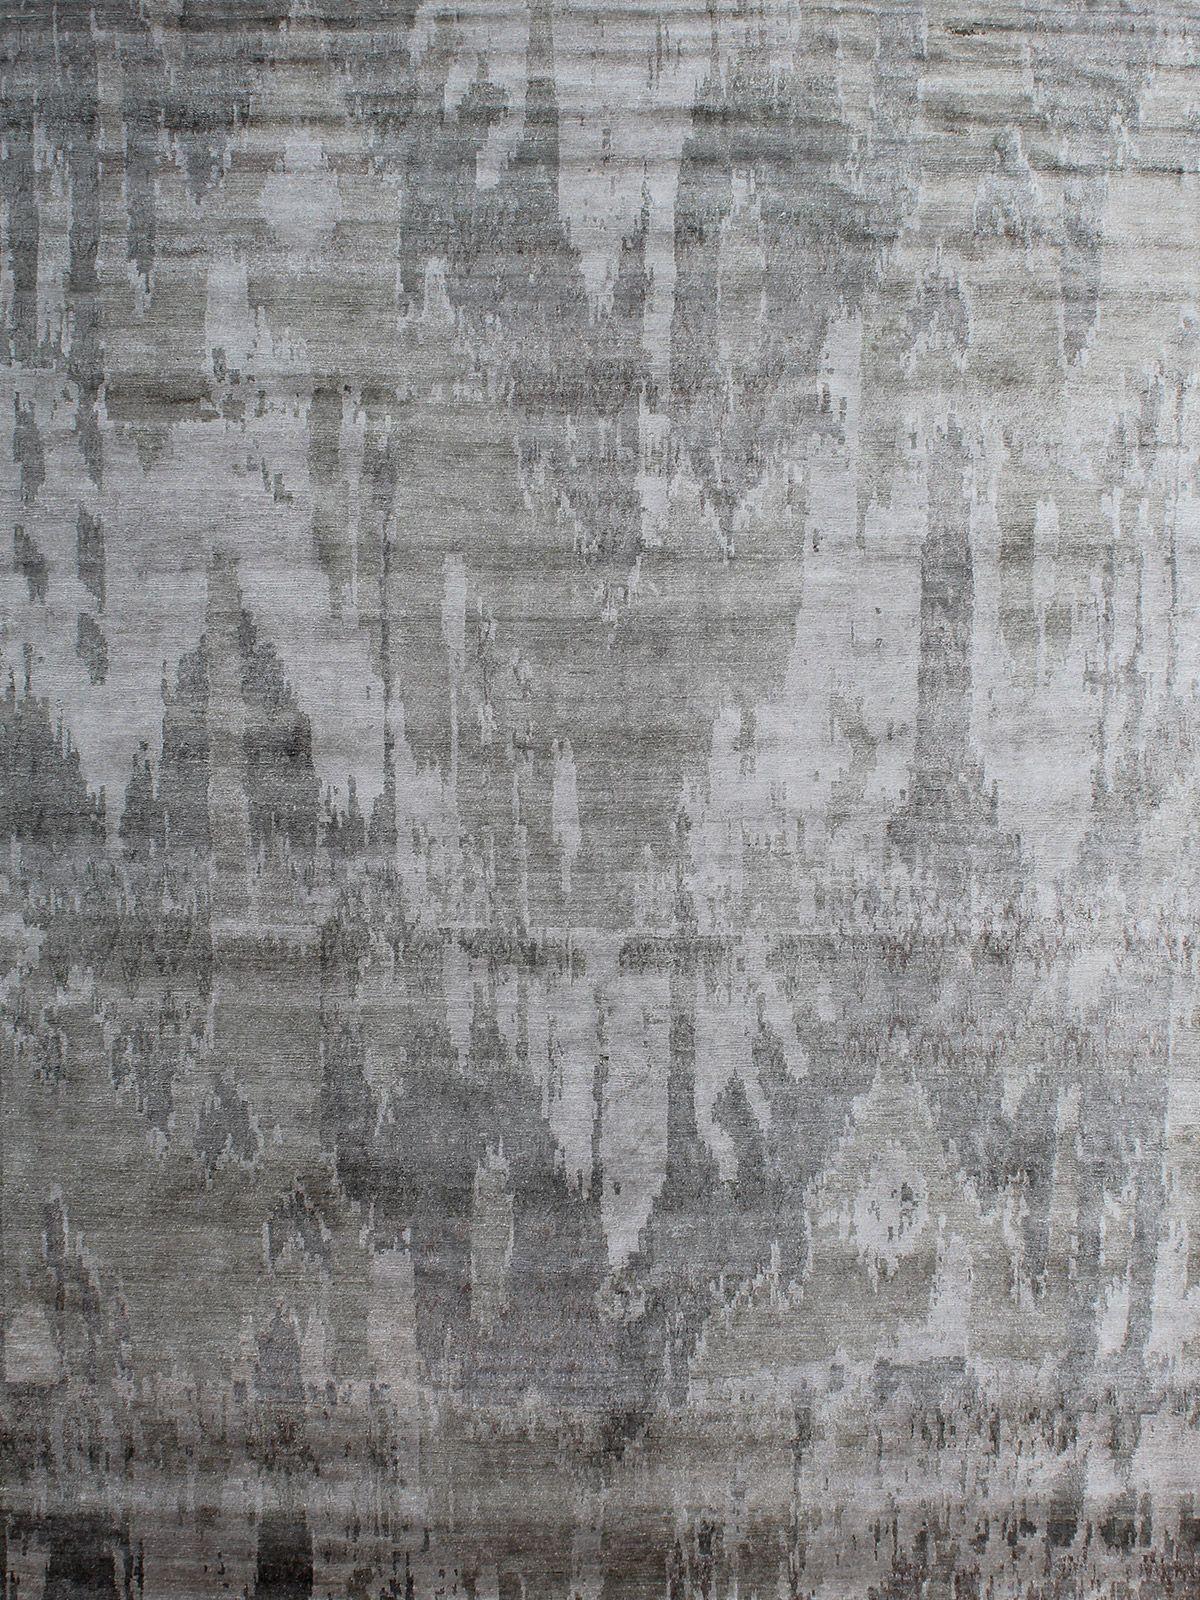 Pacha Grey Rug Bazaar Velvet London Rug Shop Rug Shopping Grey Rugs Rugs On Carpet